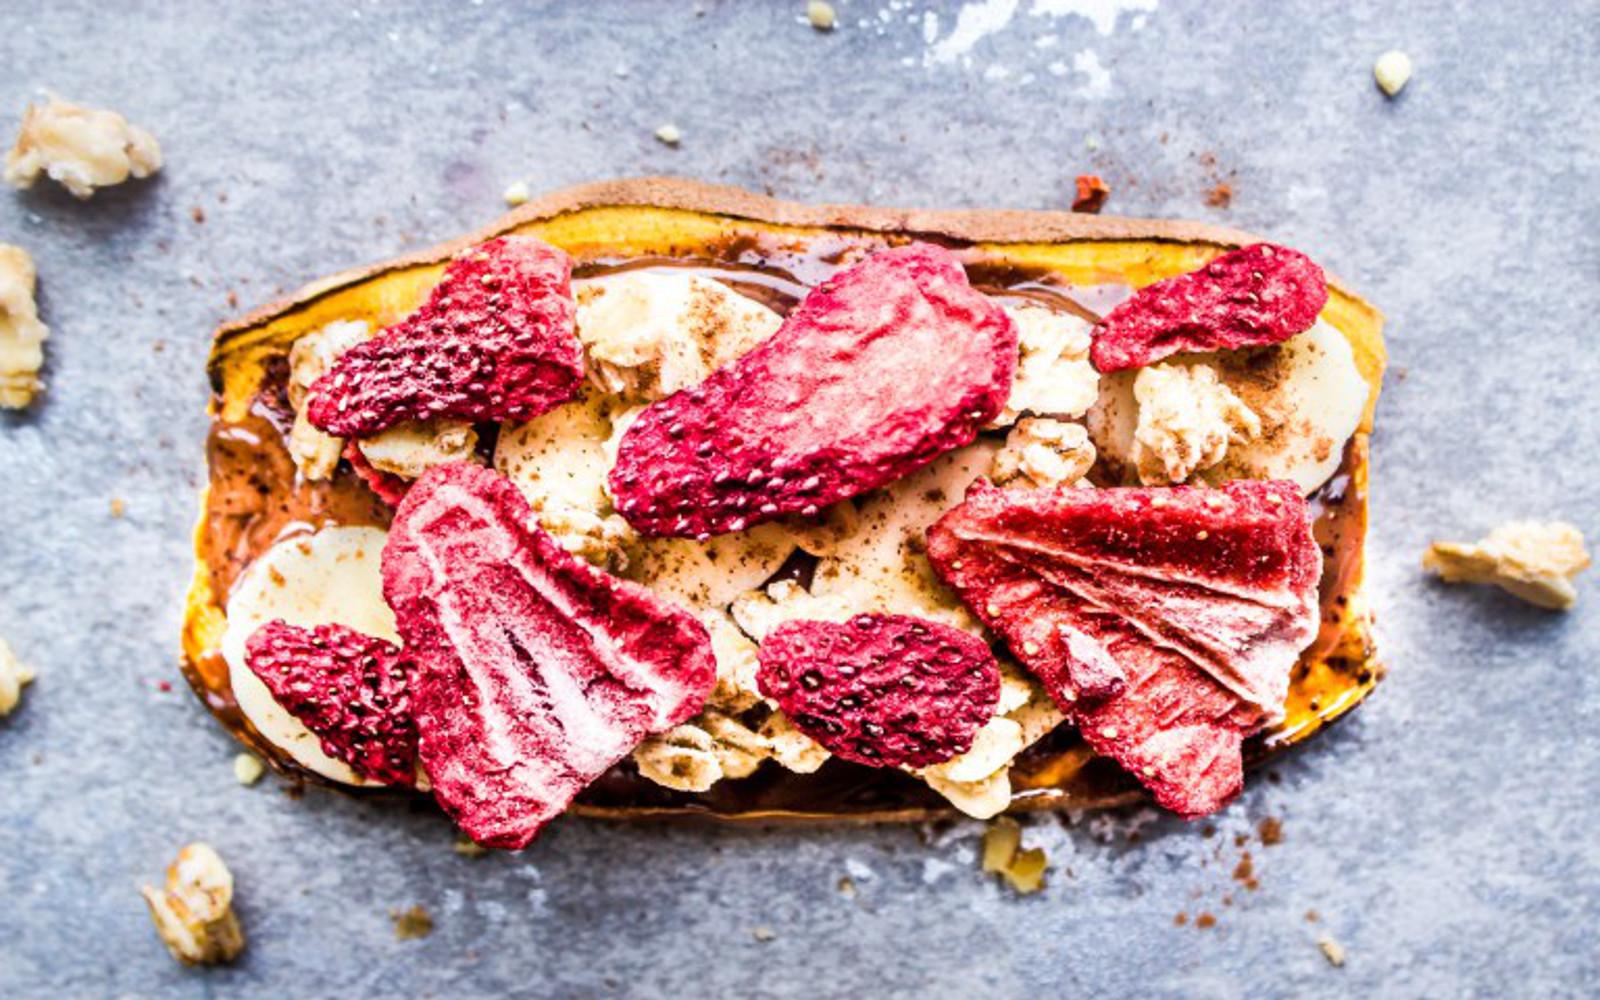 Gluten-Free Vegan Low-Carb Chocolate and Strawberry Sweet Potato Toasts with banana, granola, and hazelnut spread